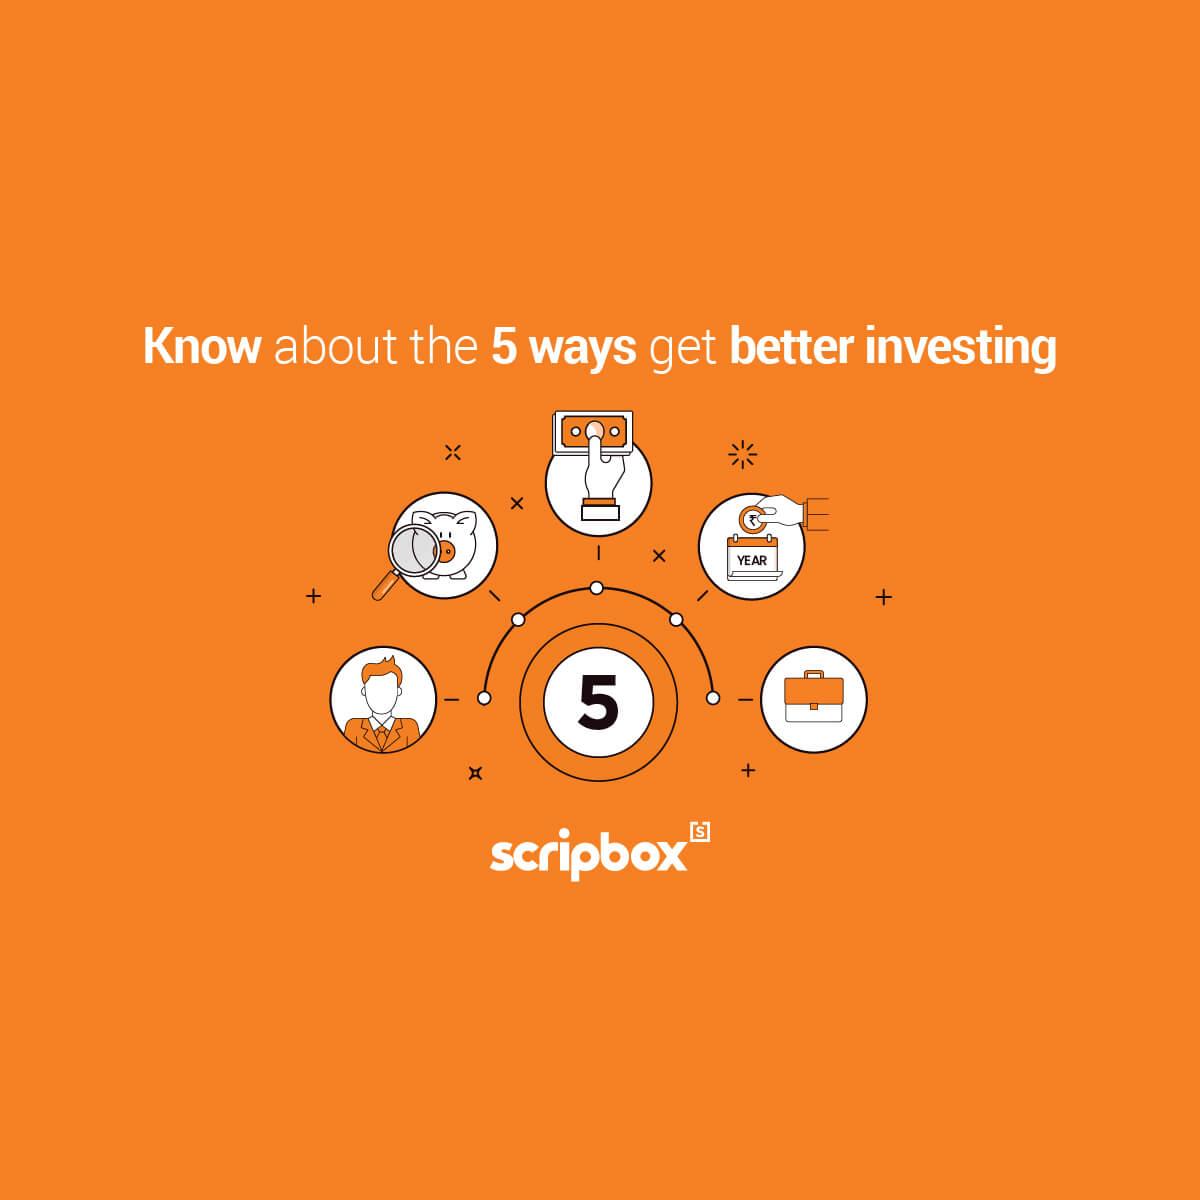 5 ways get better investing